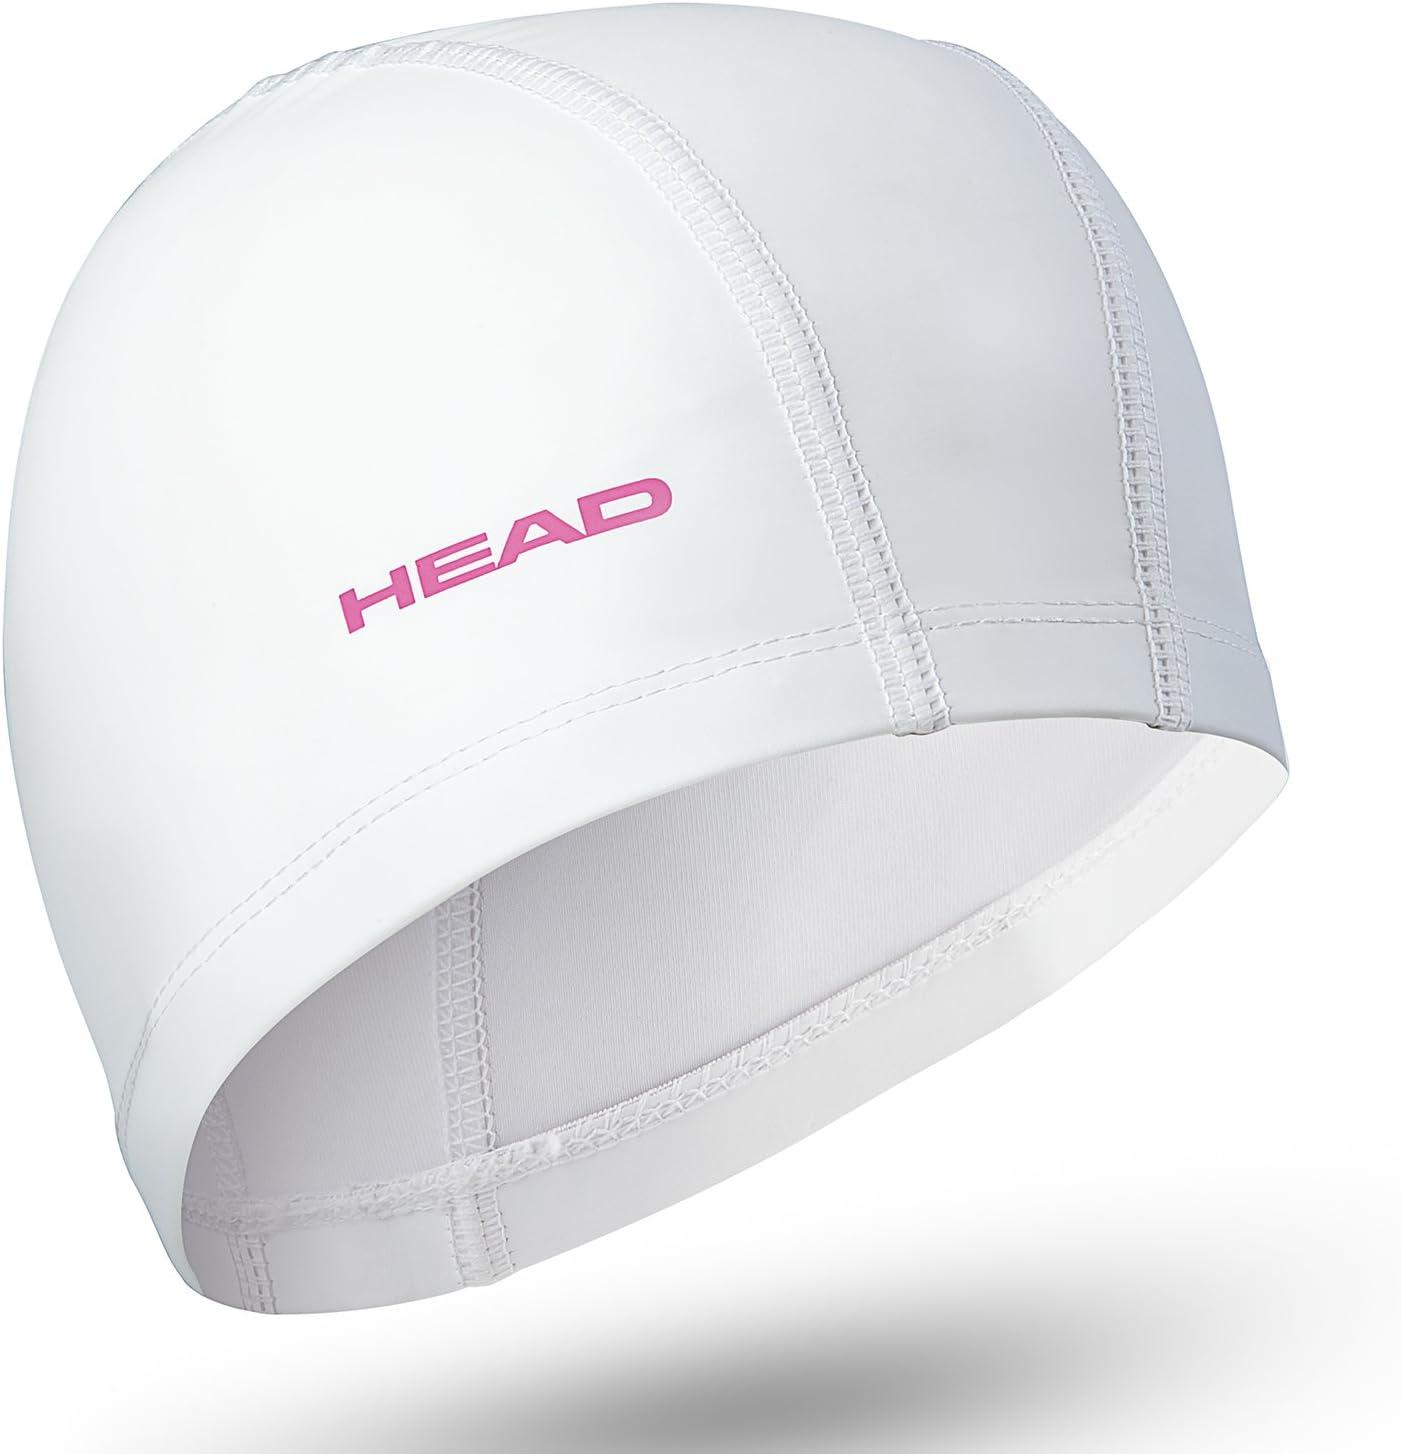 HEAD Nylon//Spandex Adult Swimming Cap